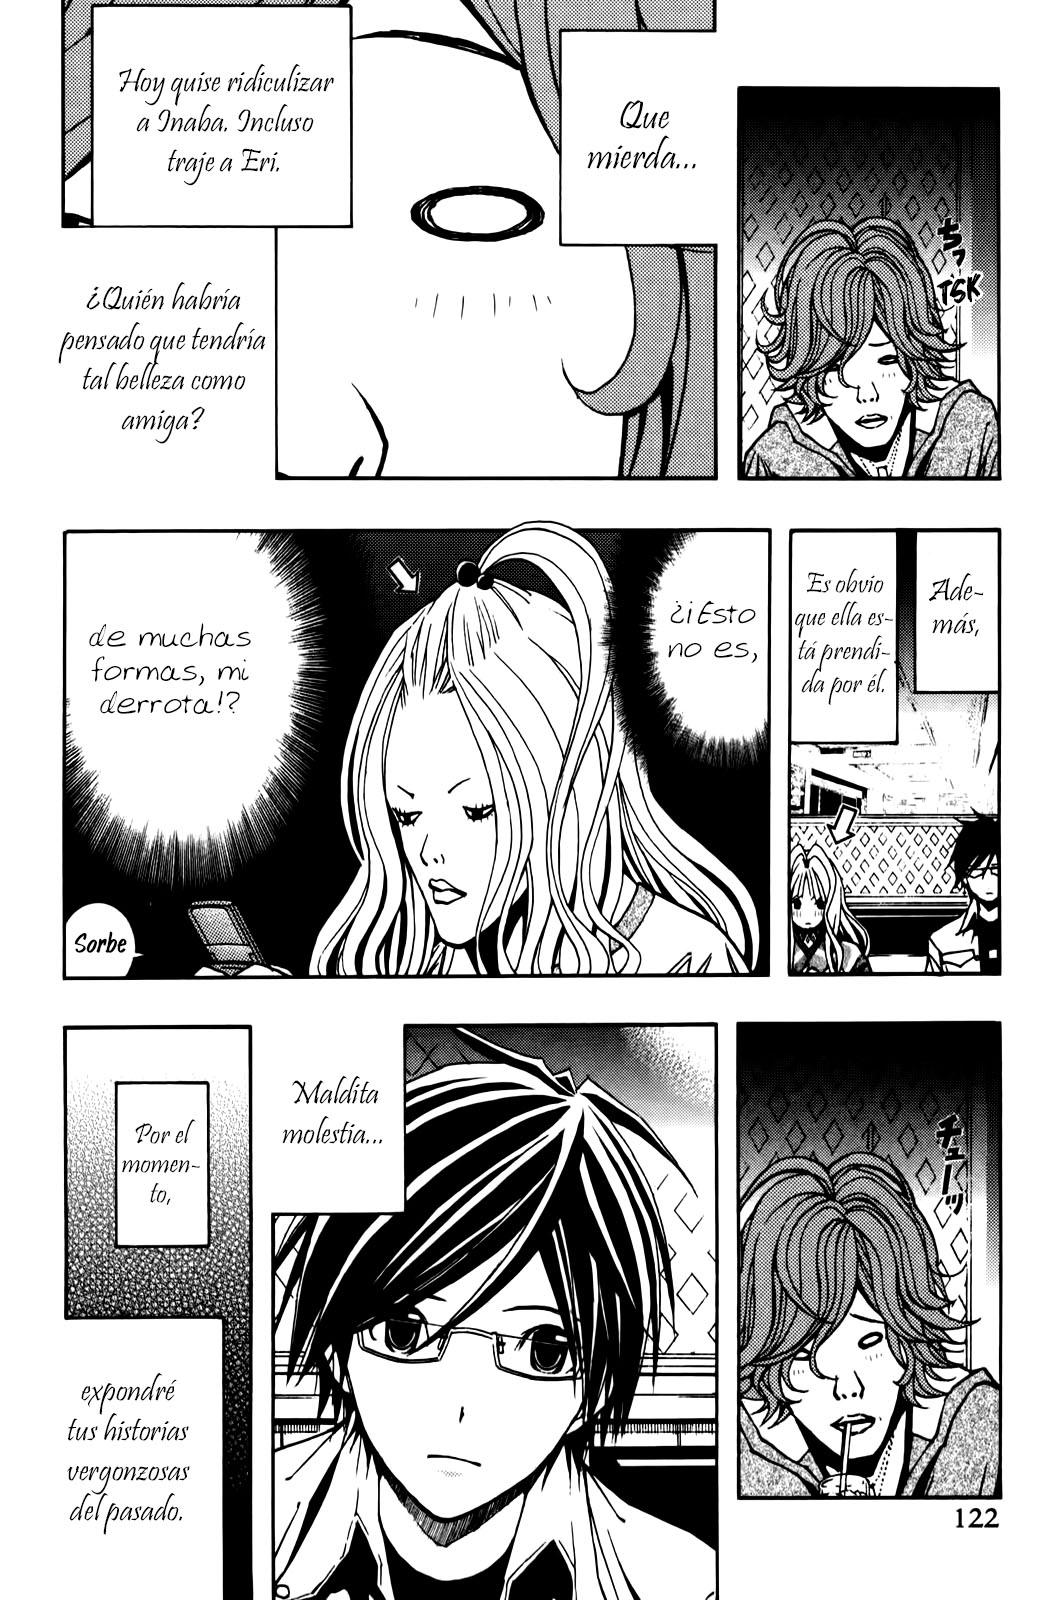 http://c5.ninemanga.com/es_manga/20/18580/468329/f26b07a1c7a408950e2bcf9c6b354e0c.jpg Page 9